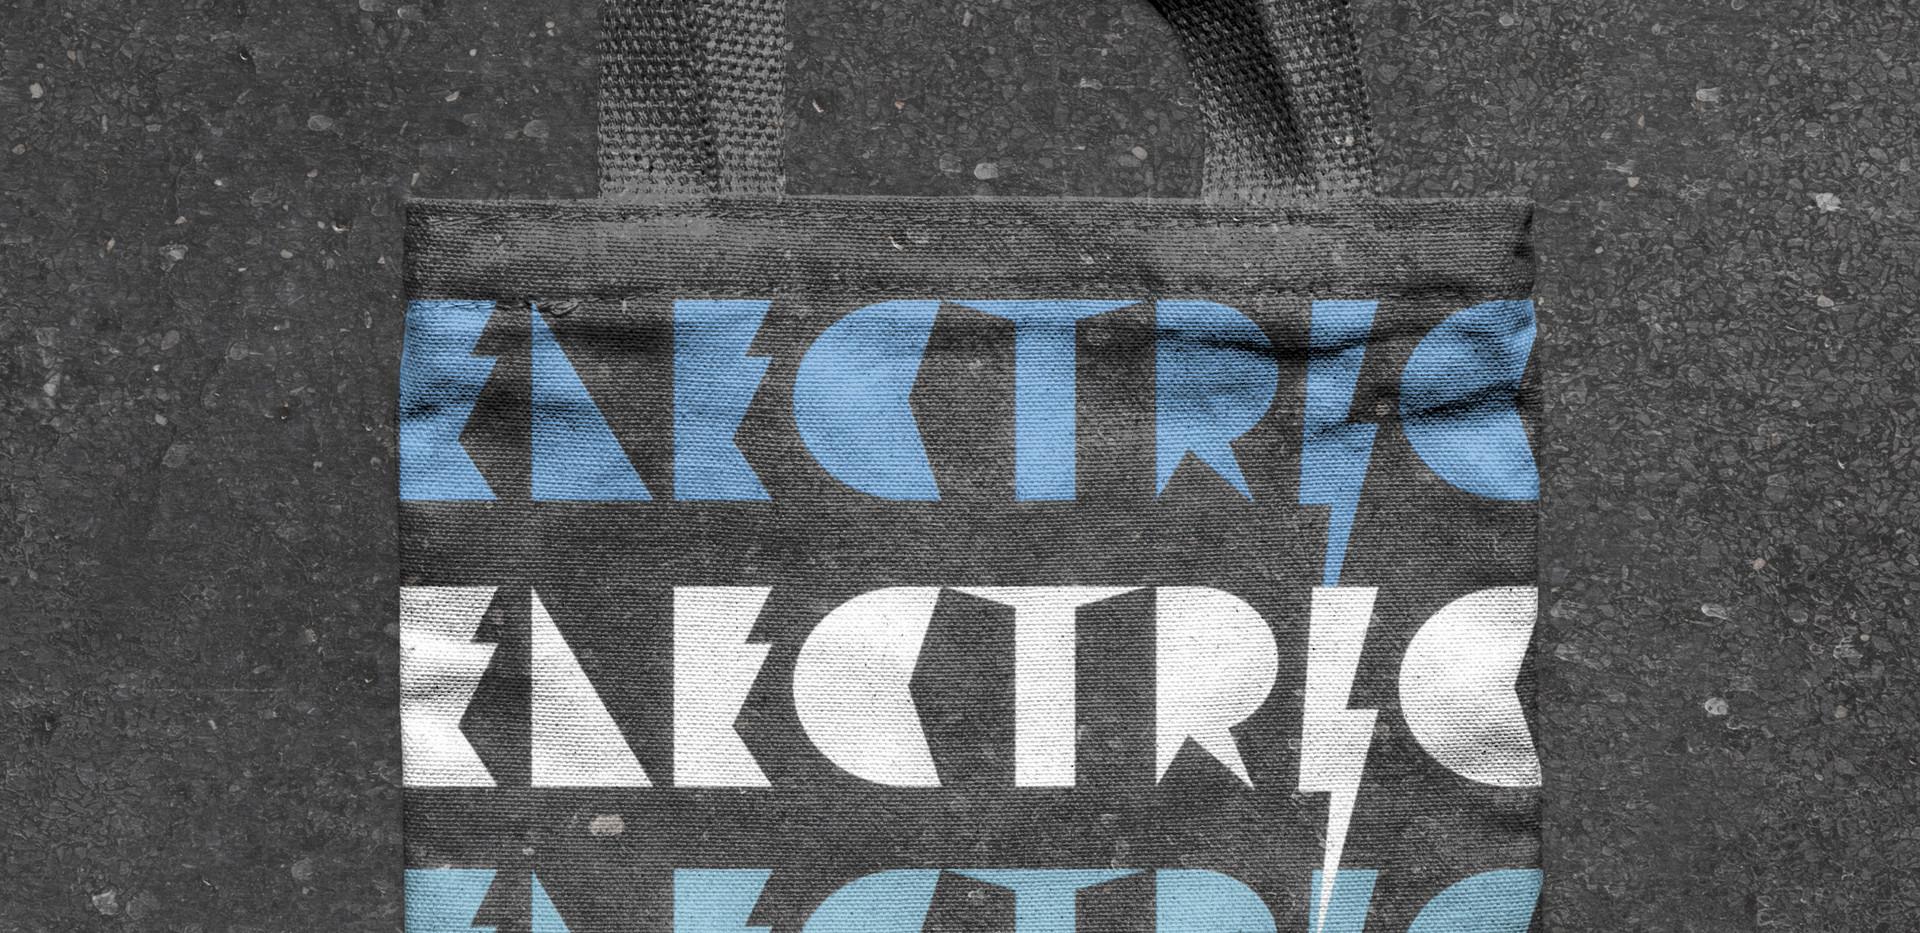 electricicebag (1).jpg